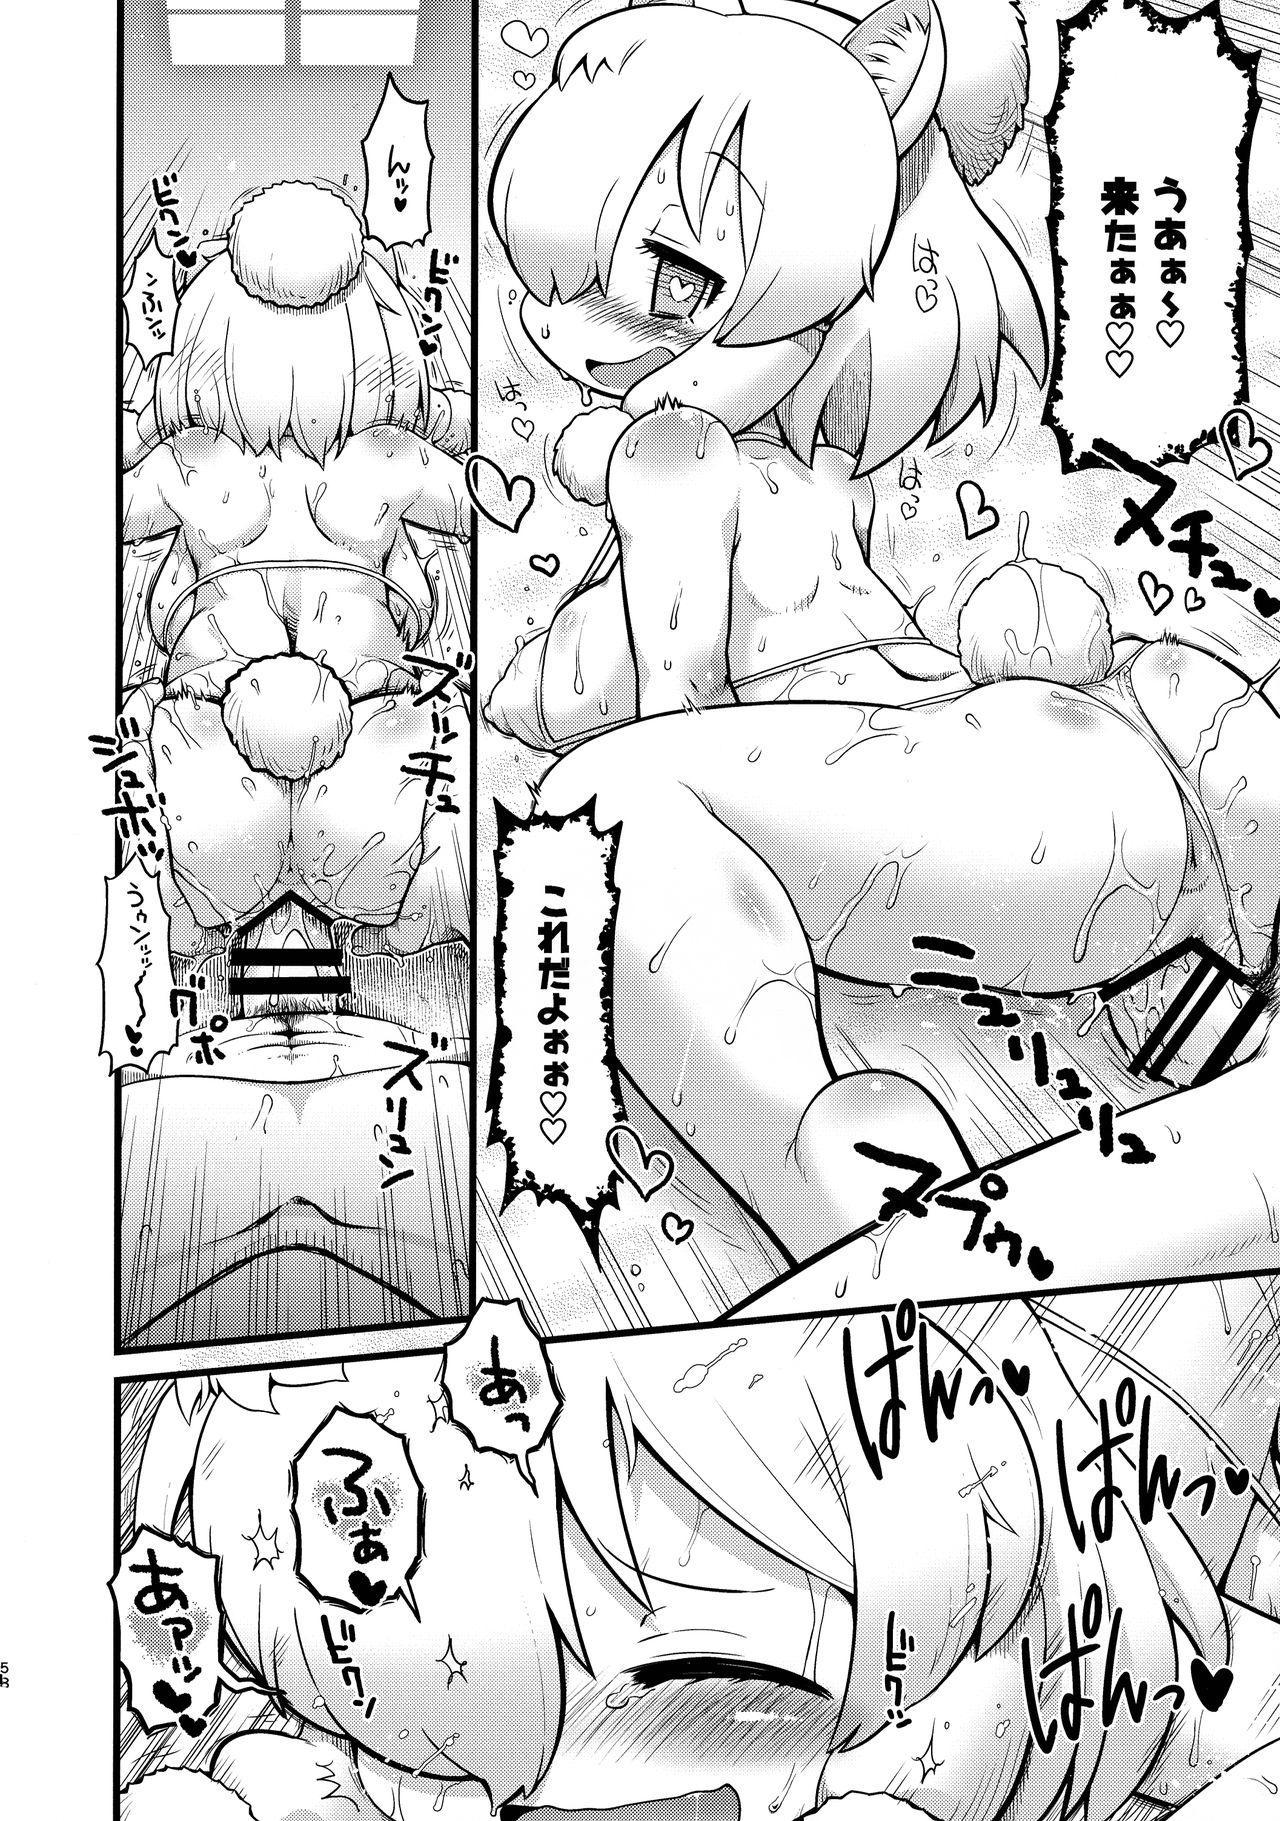 Fuwaaa! Irasshaai! Ura Iyashi no Alpaca-san Goudou 57